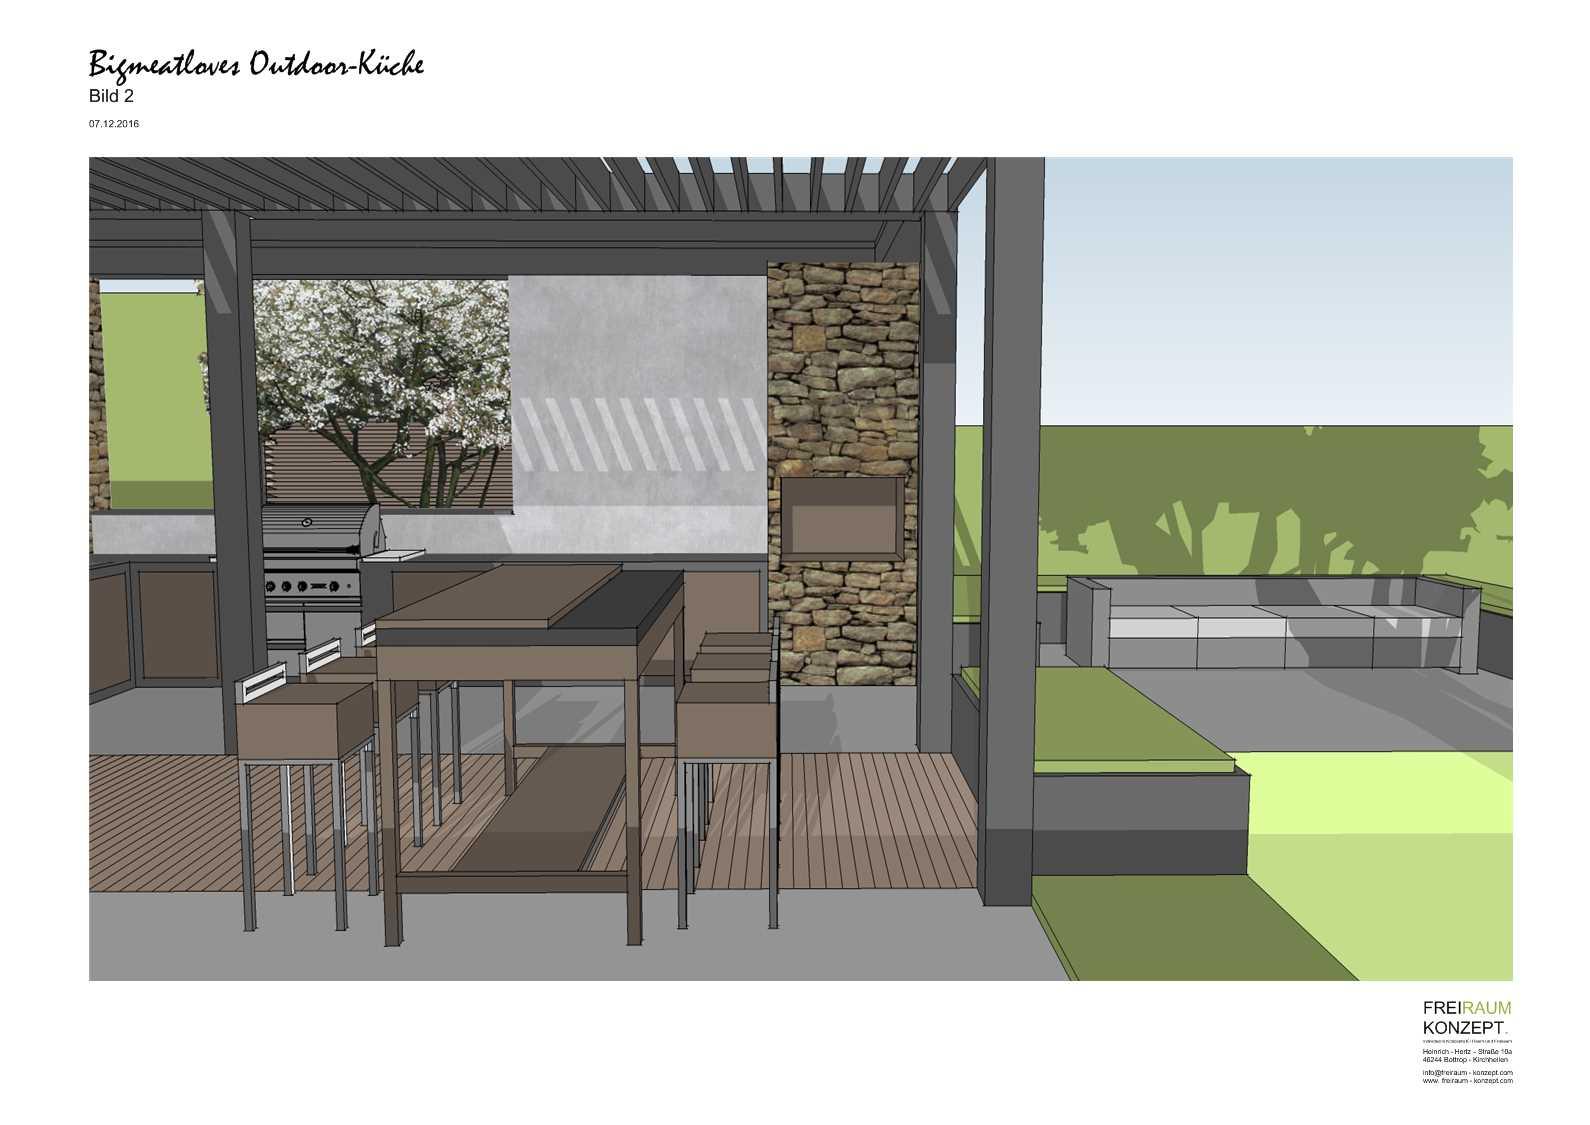 Outdoorküche Garten Hamburg : Outdoorküche garten hamburg outdoorküchen möbel gebraucht kaufen